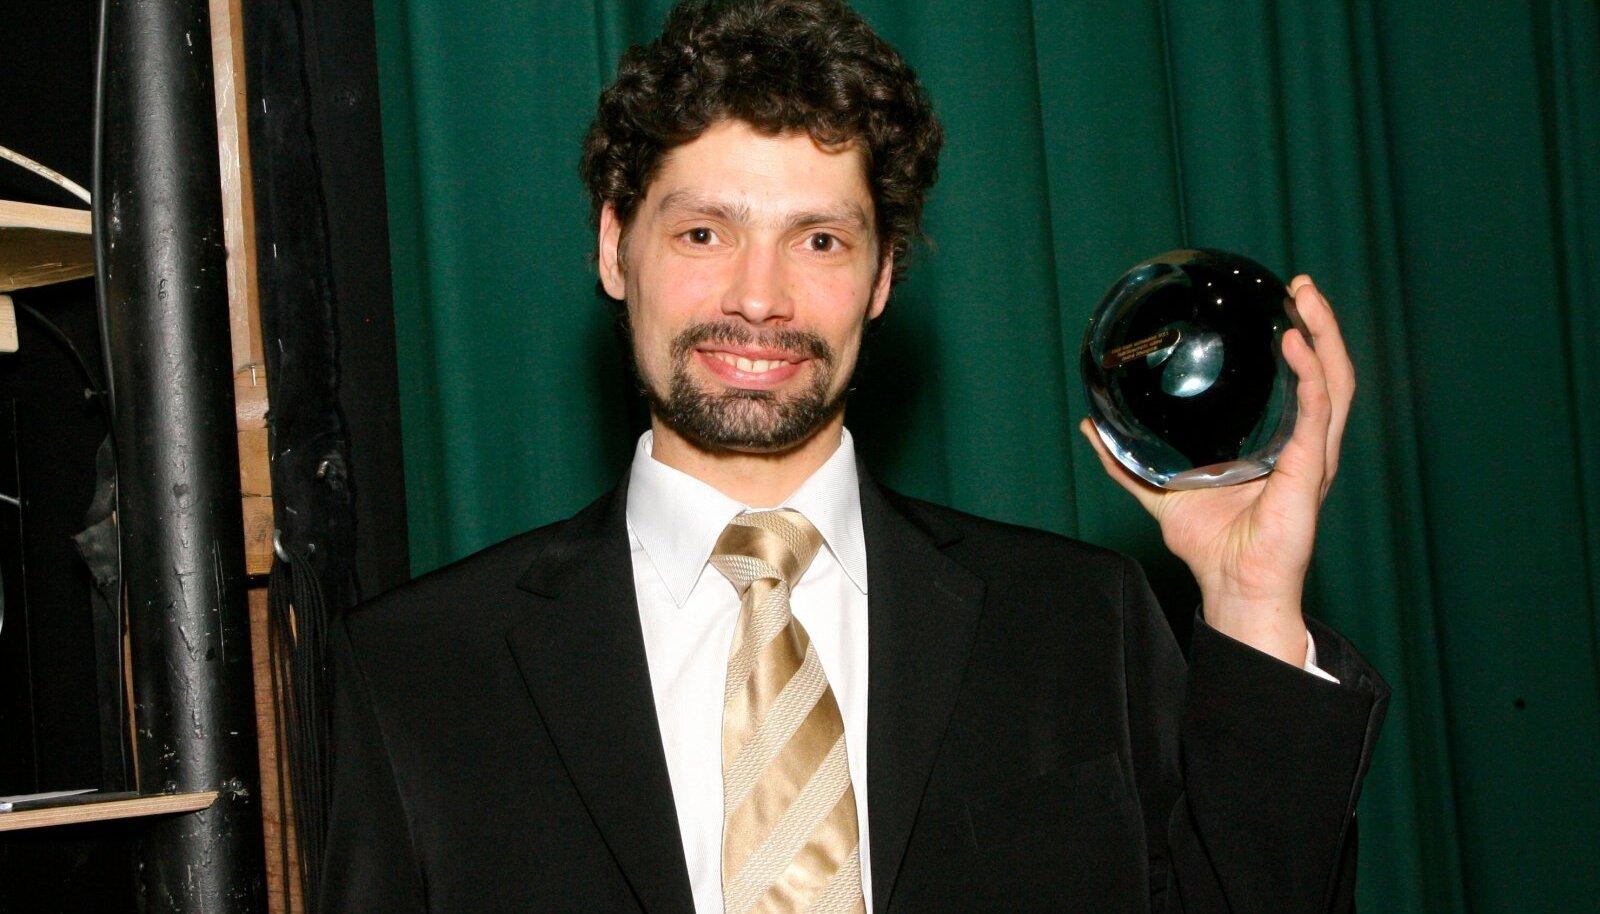 Anatoli Arhangelski